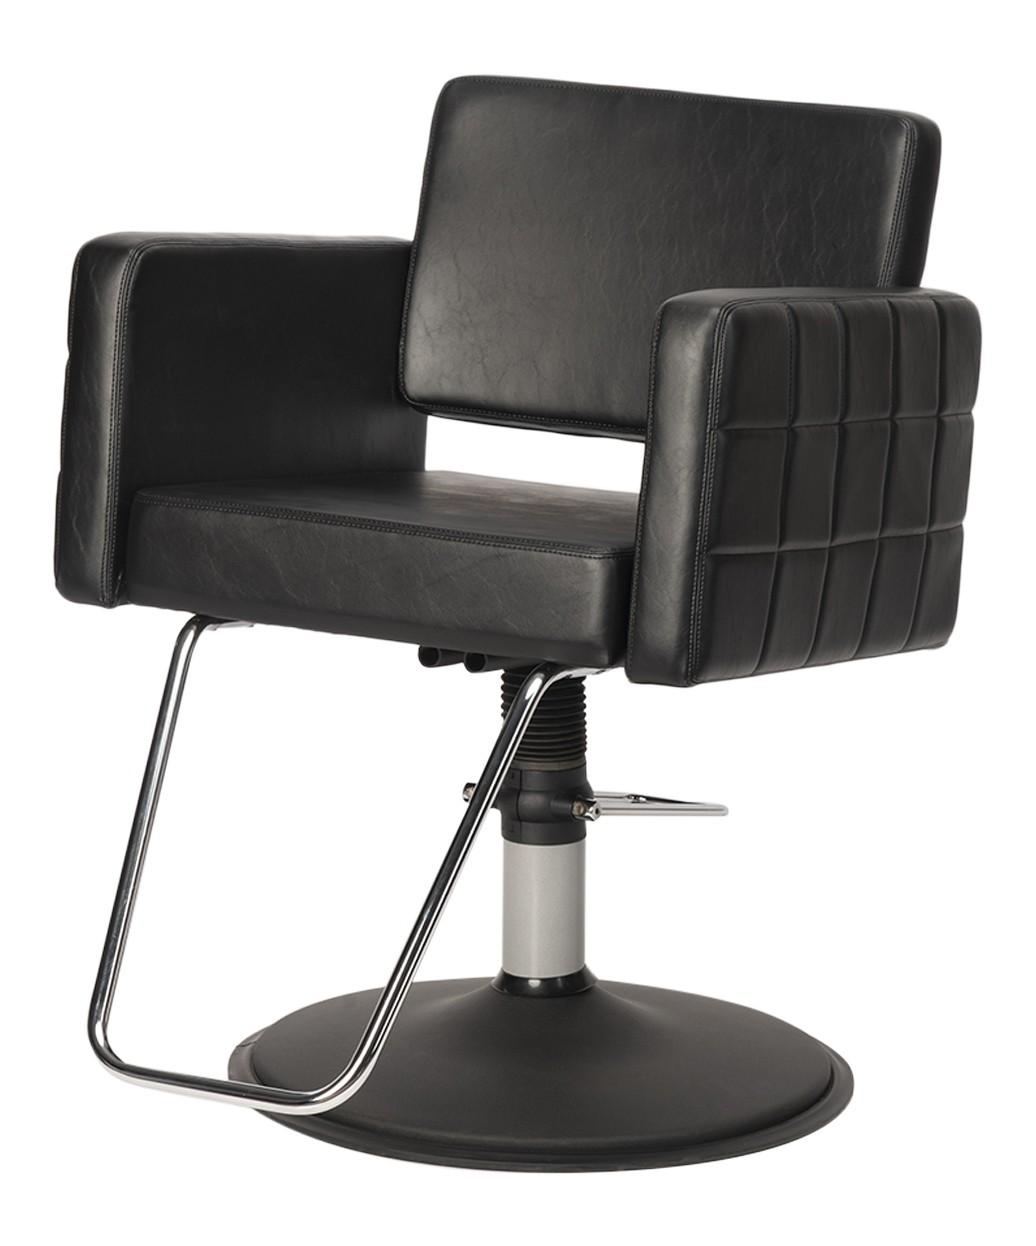 Belvedere BU12 Nova Styling Chair